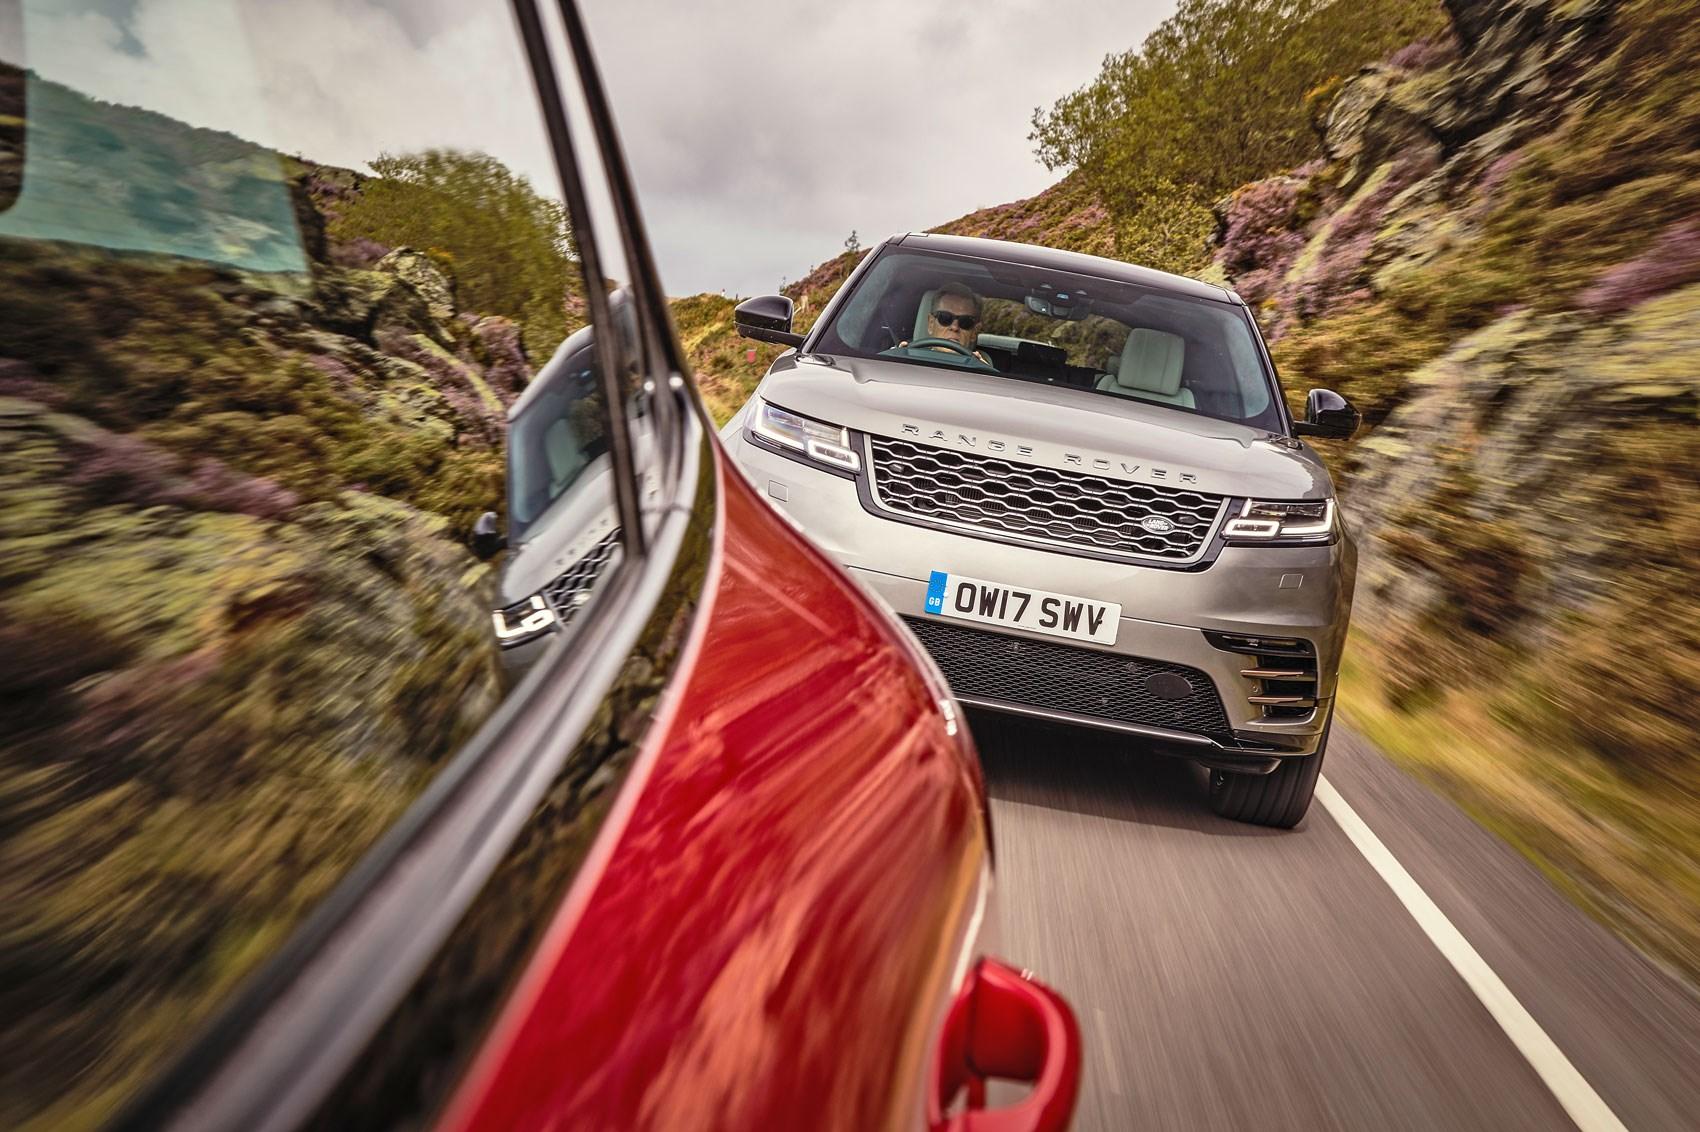 Range Rover Velar vs Porsche Macan GTS (2017) twin test